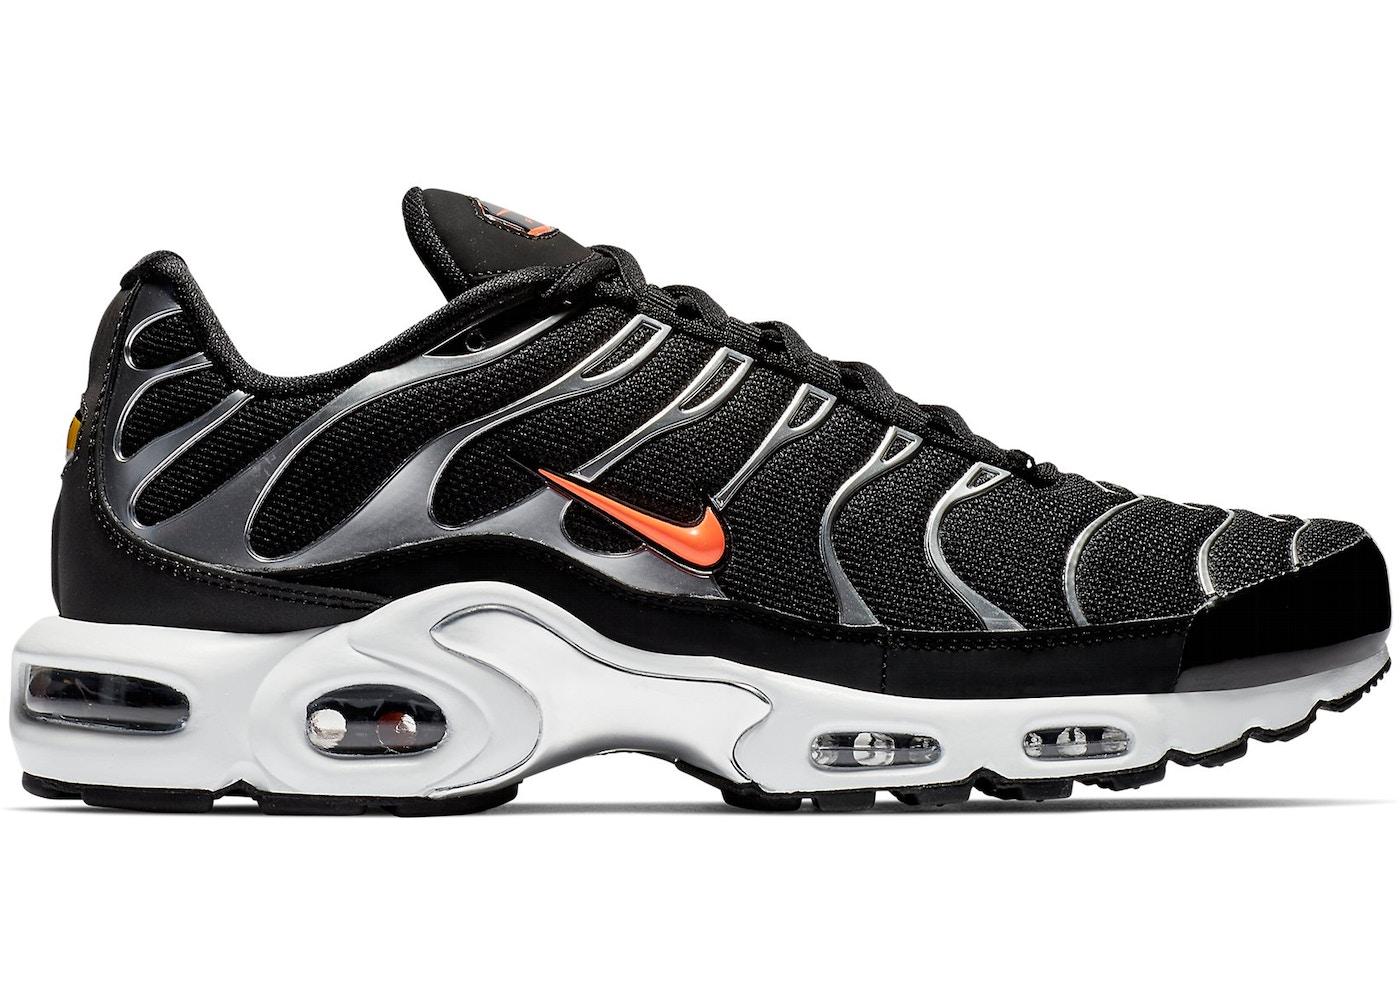 Nike Air Max Plus TN Black Metallic Silver Mens Running Shoes NIKE ND000746